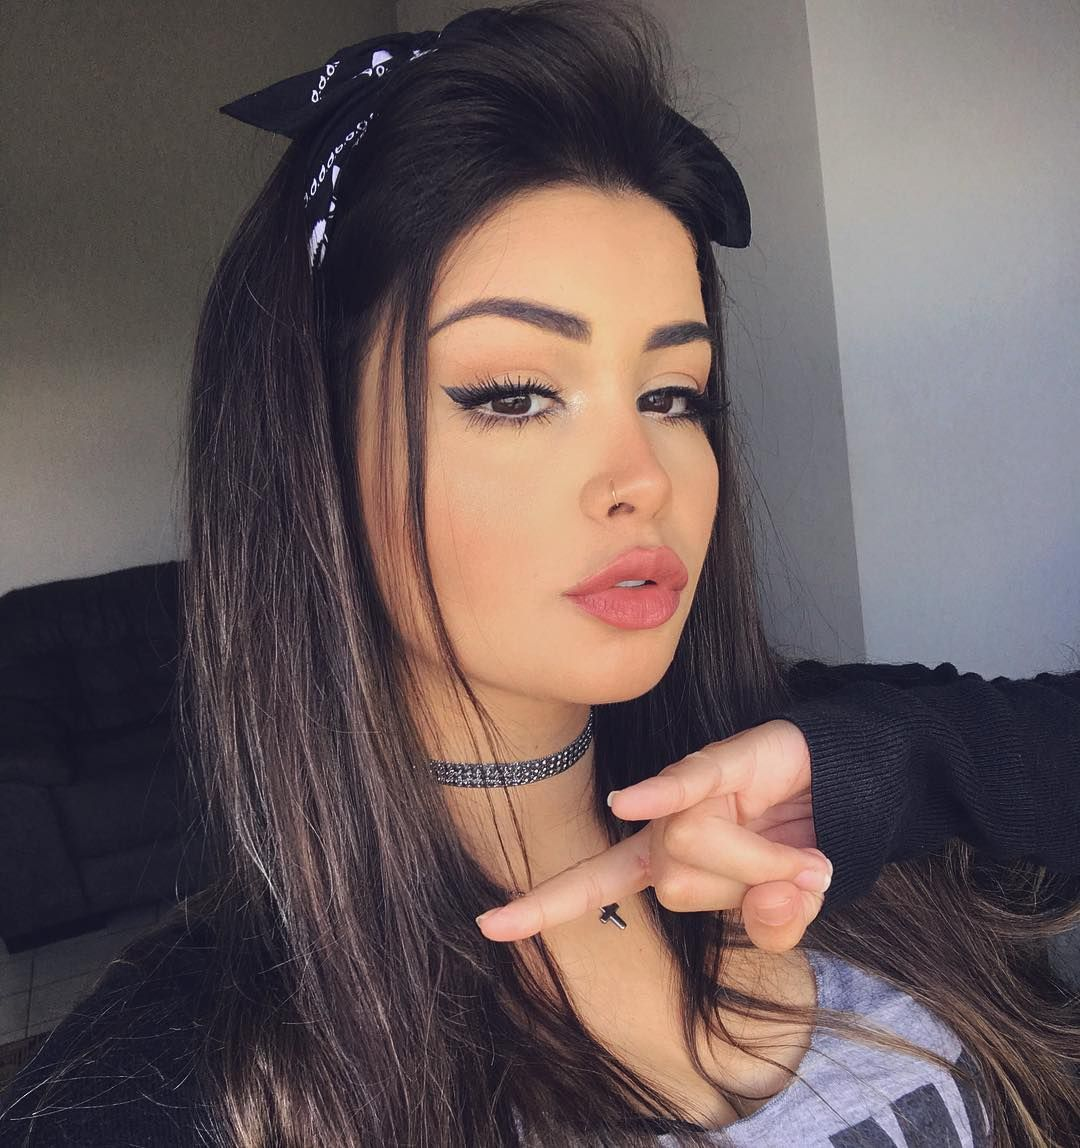 17 3 Mil Curtidas 106 Comentários Amanda Hummer Hummer Aj No Instagram Ahhh Mas Aqui é Peinados Con Bandana Cabello Y Maquillaje Pañuelos Para Cabello